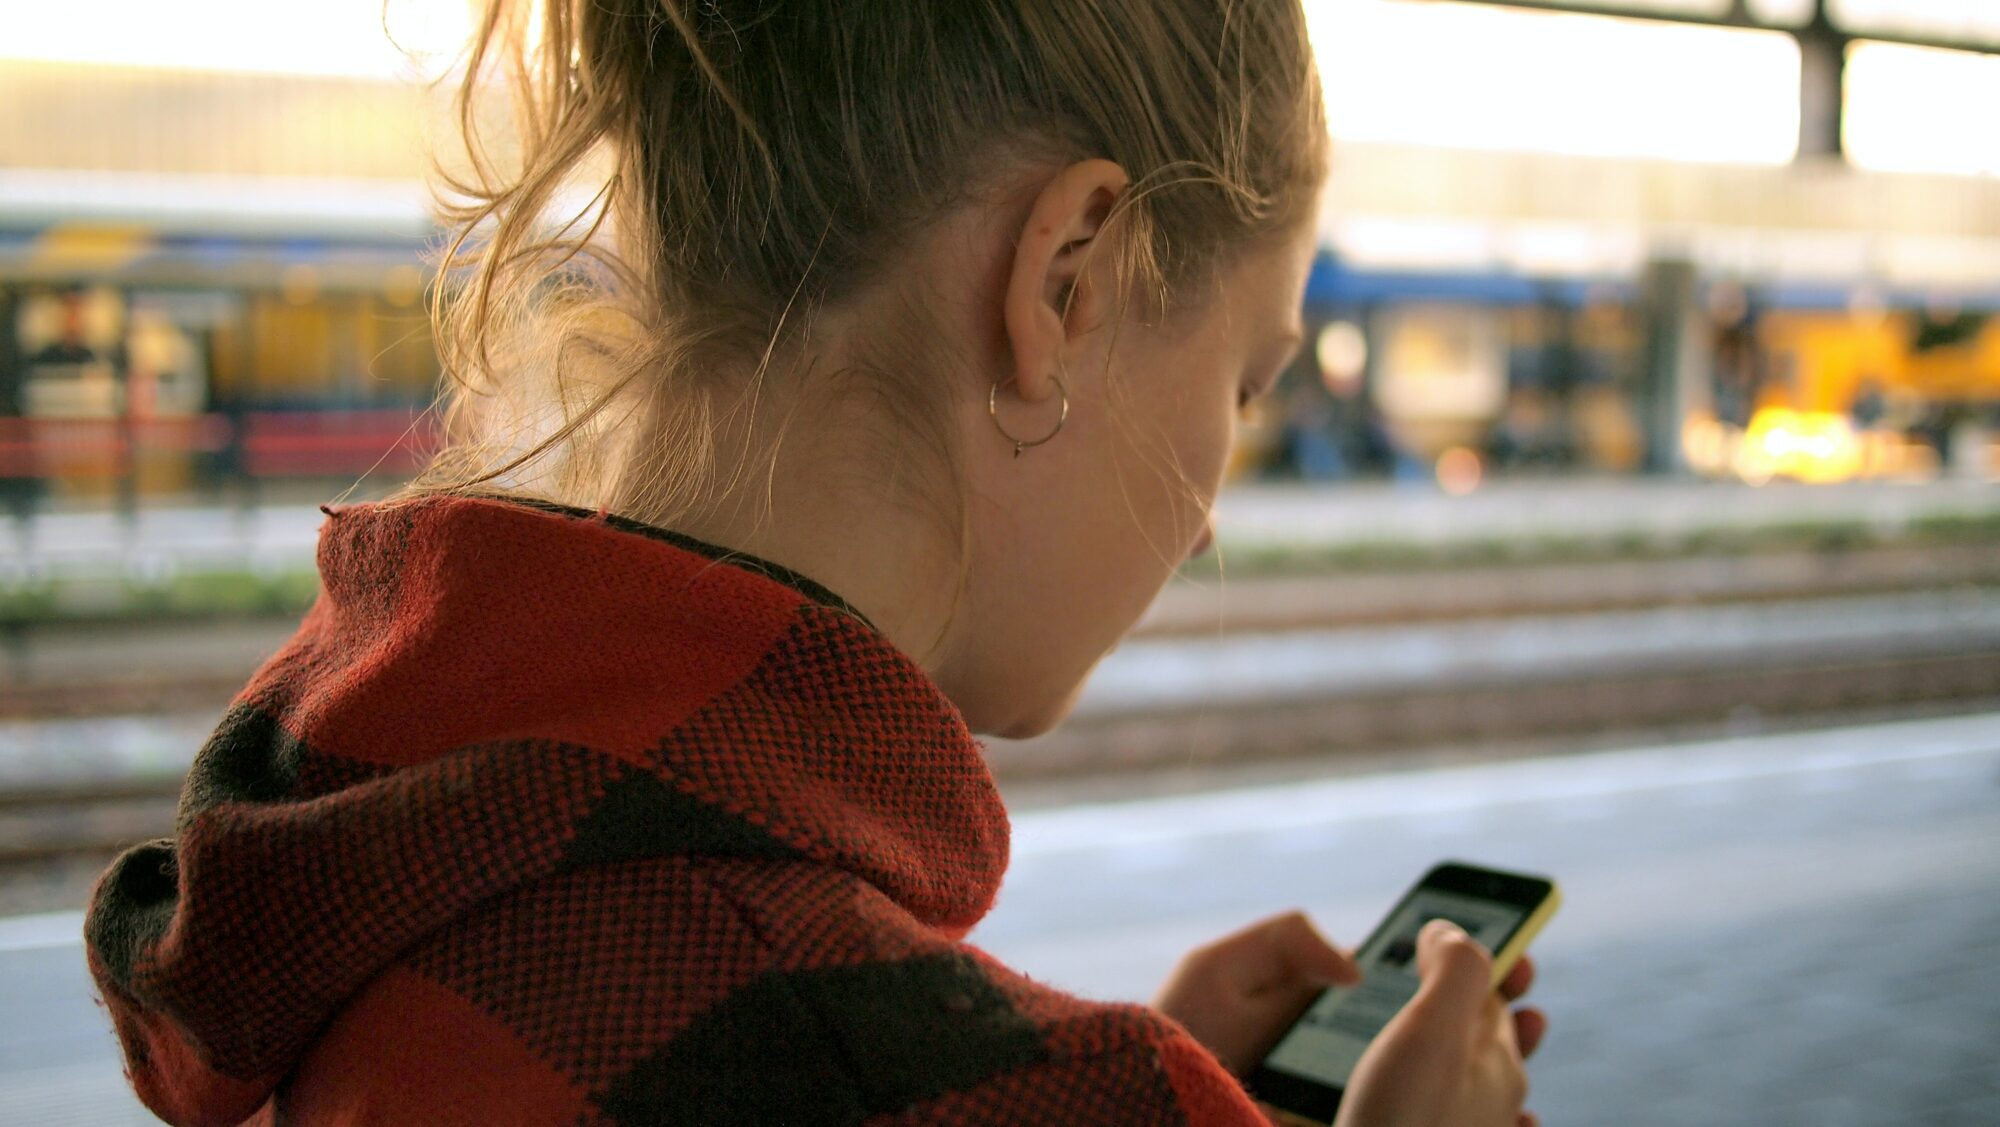 Frau mit Smartphone am Bahnsteig